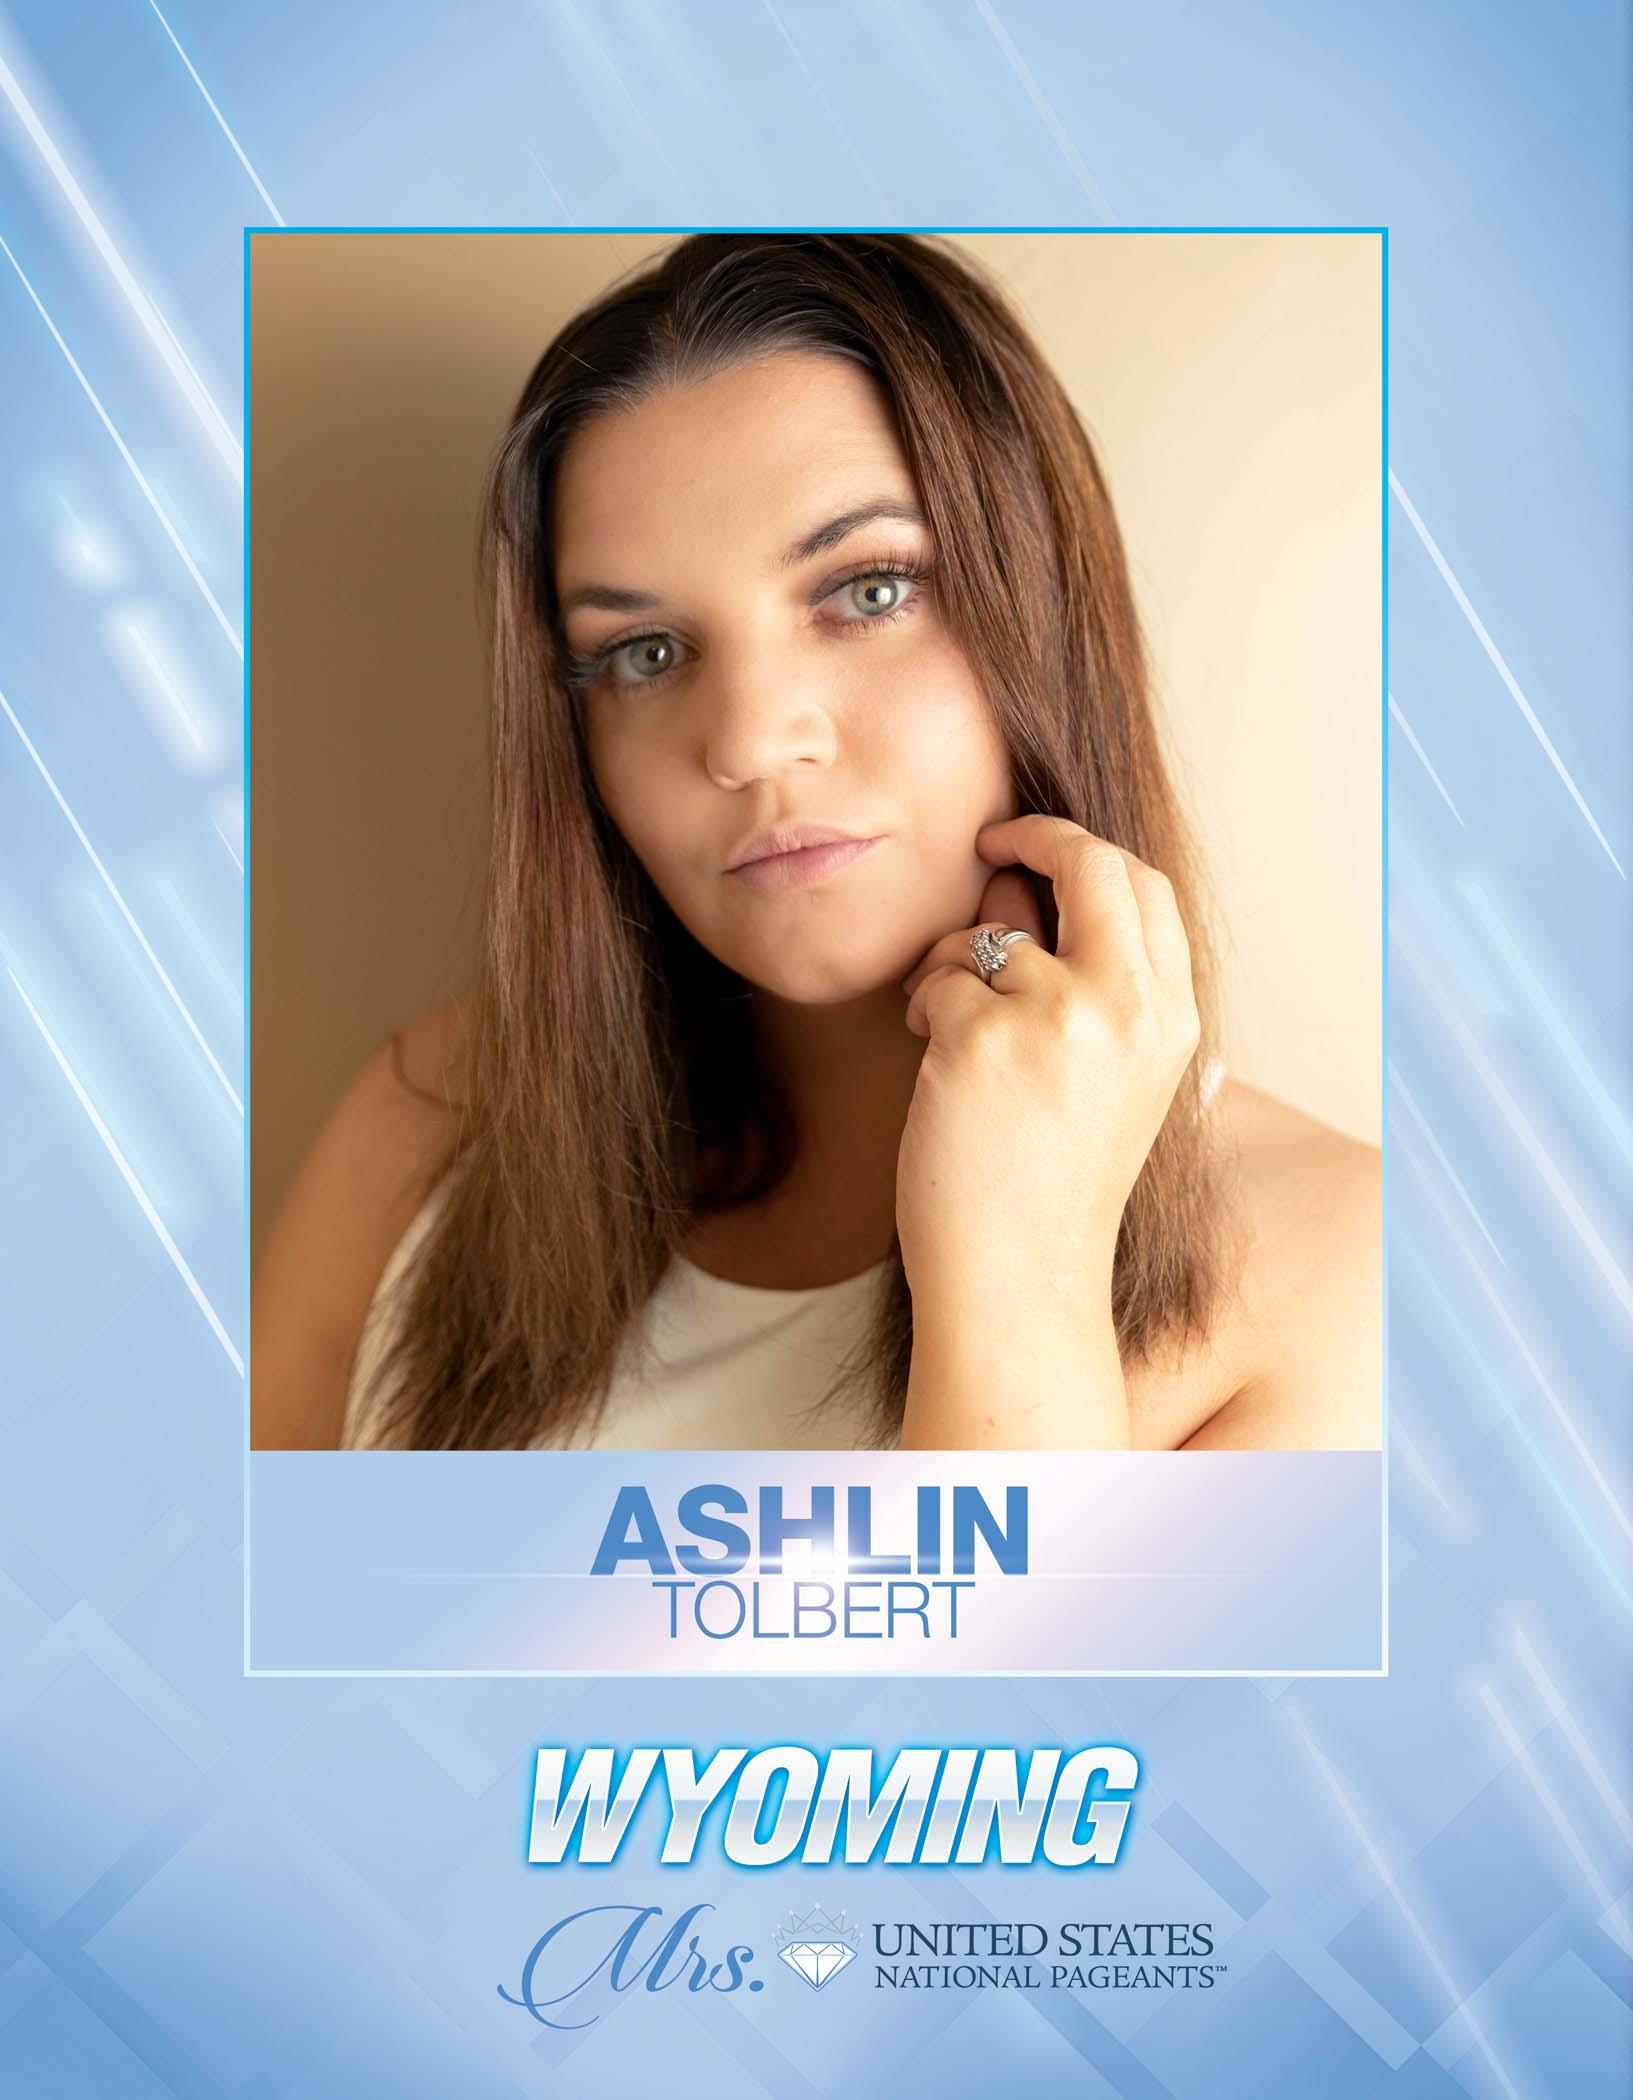 Ashlin Tolbert Mrs. Wyoming United States - 2021